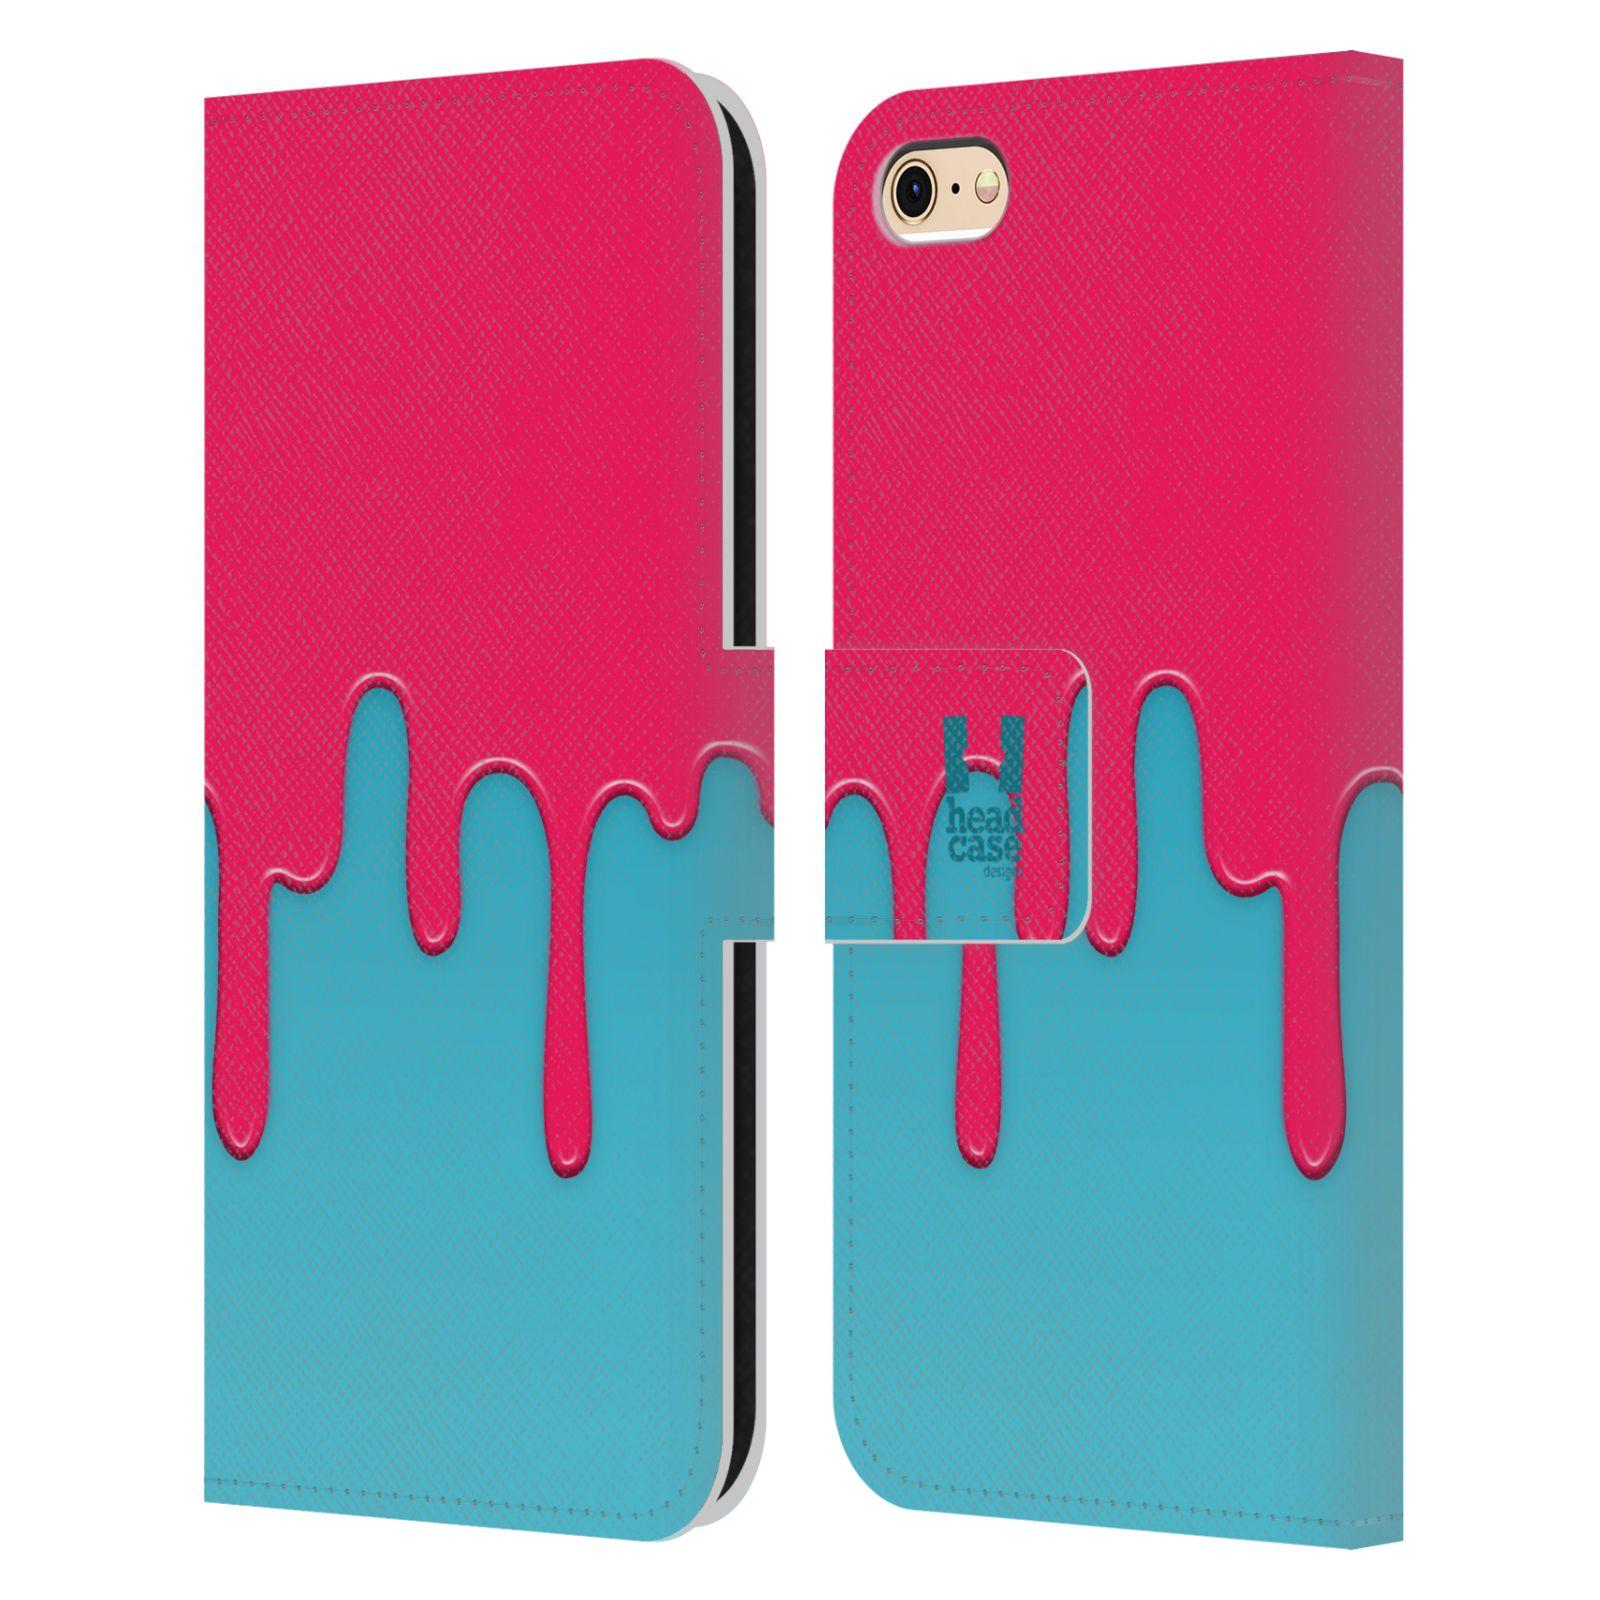 HEAD CASE Flipové pouzdro pro mobil Apple Iphone 6/6s Rozlitá barva růžová a modrá